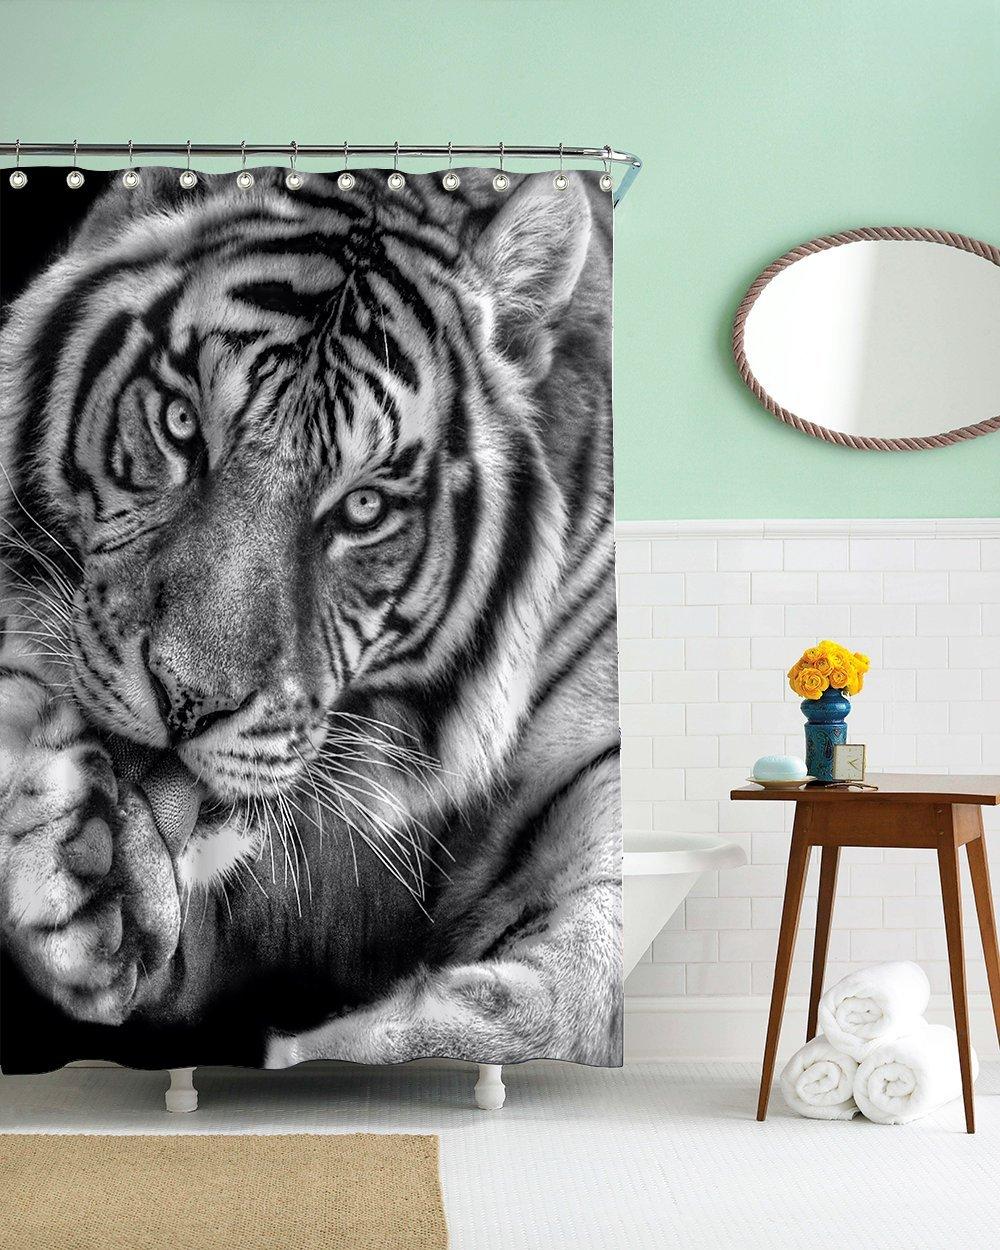 Gwein Black and White of Wild Animals Tiger Home Decor Shower Curtain Polyester Fabric Mildew Proof Waterproof Cloth Shower Room Decor Shower Curtains 66x72 by Gwein